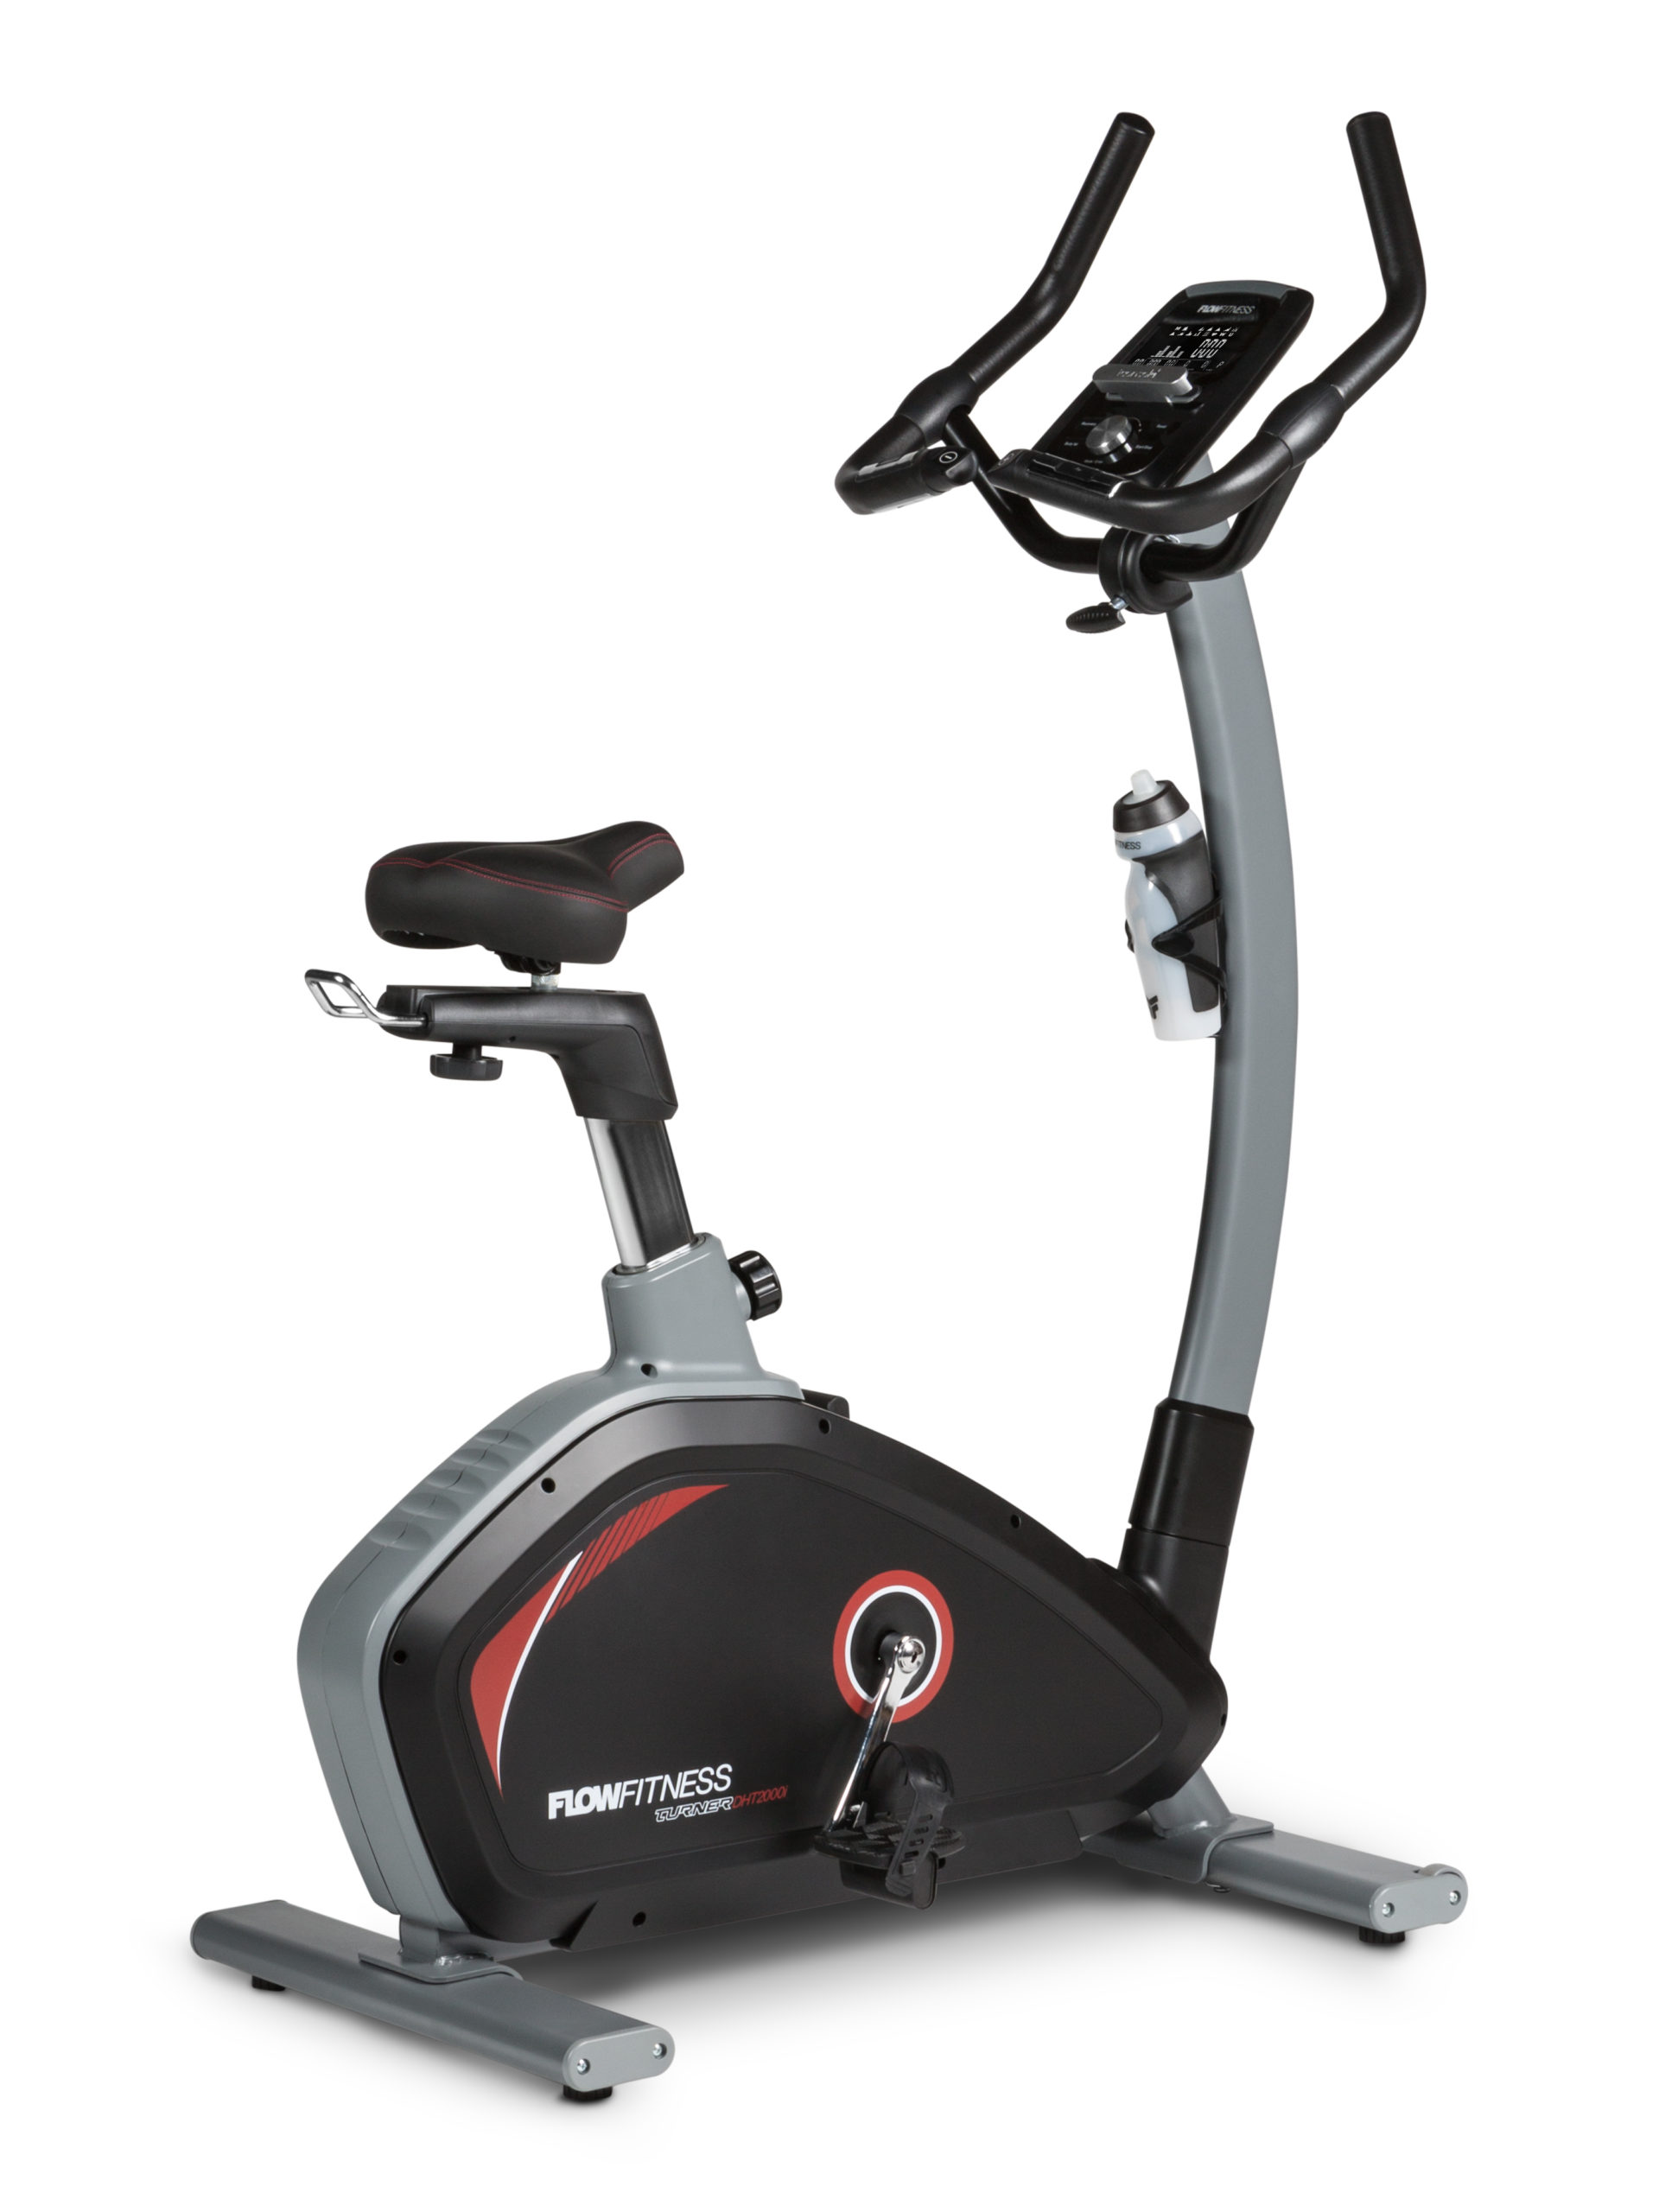 Flow Fitness Tabel Turner DHT2000i Hometrainer 1